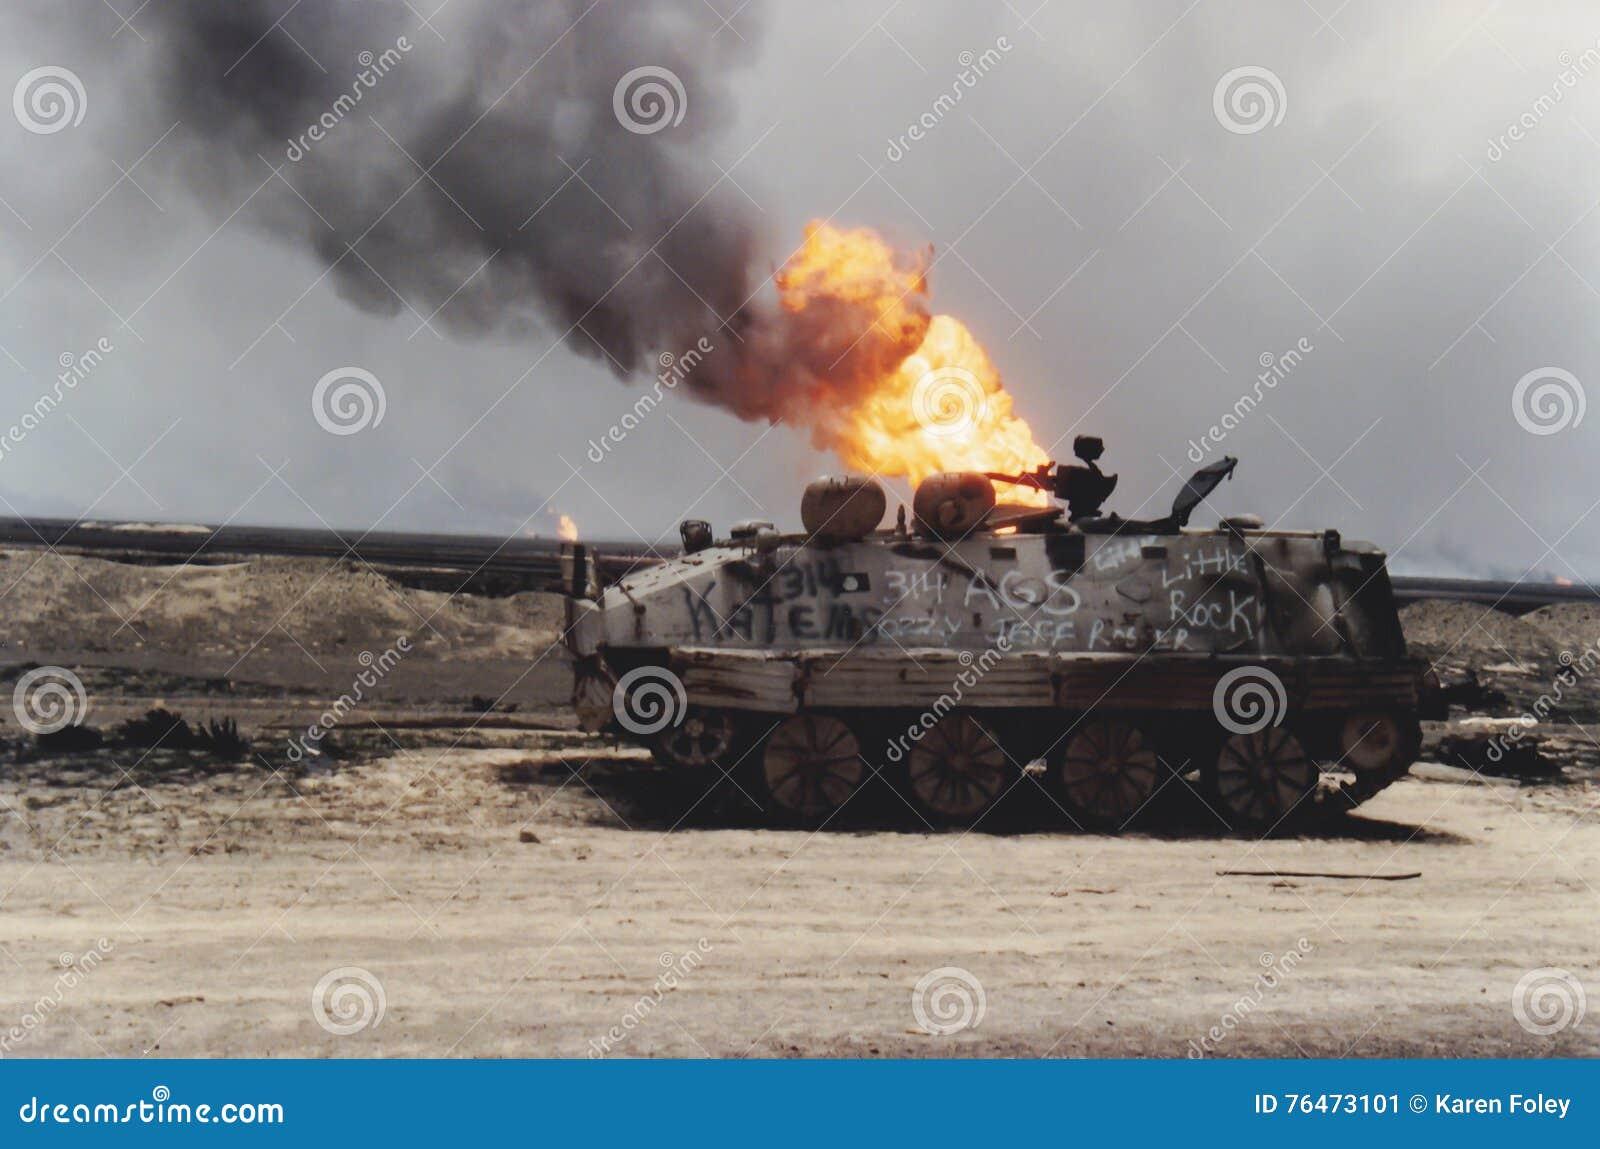 Fogo do tanque e do poço de petróleo, Kuwait, guerra do Golfo Pérsico